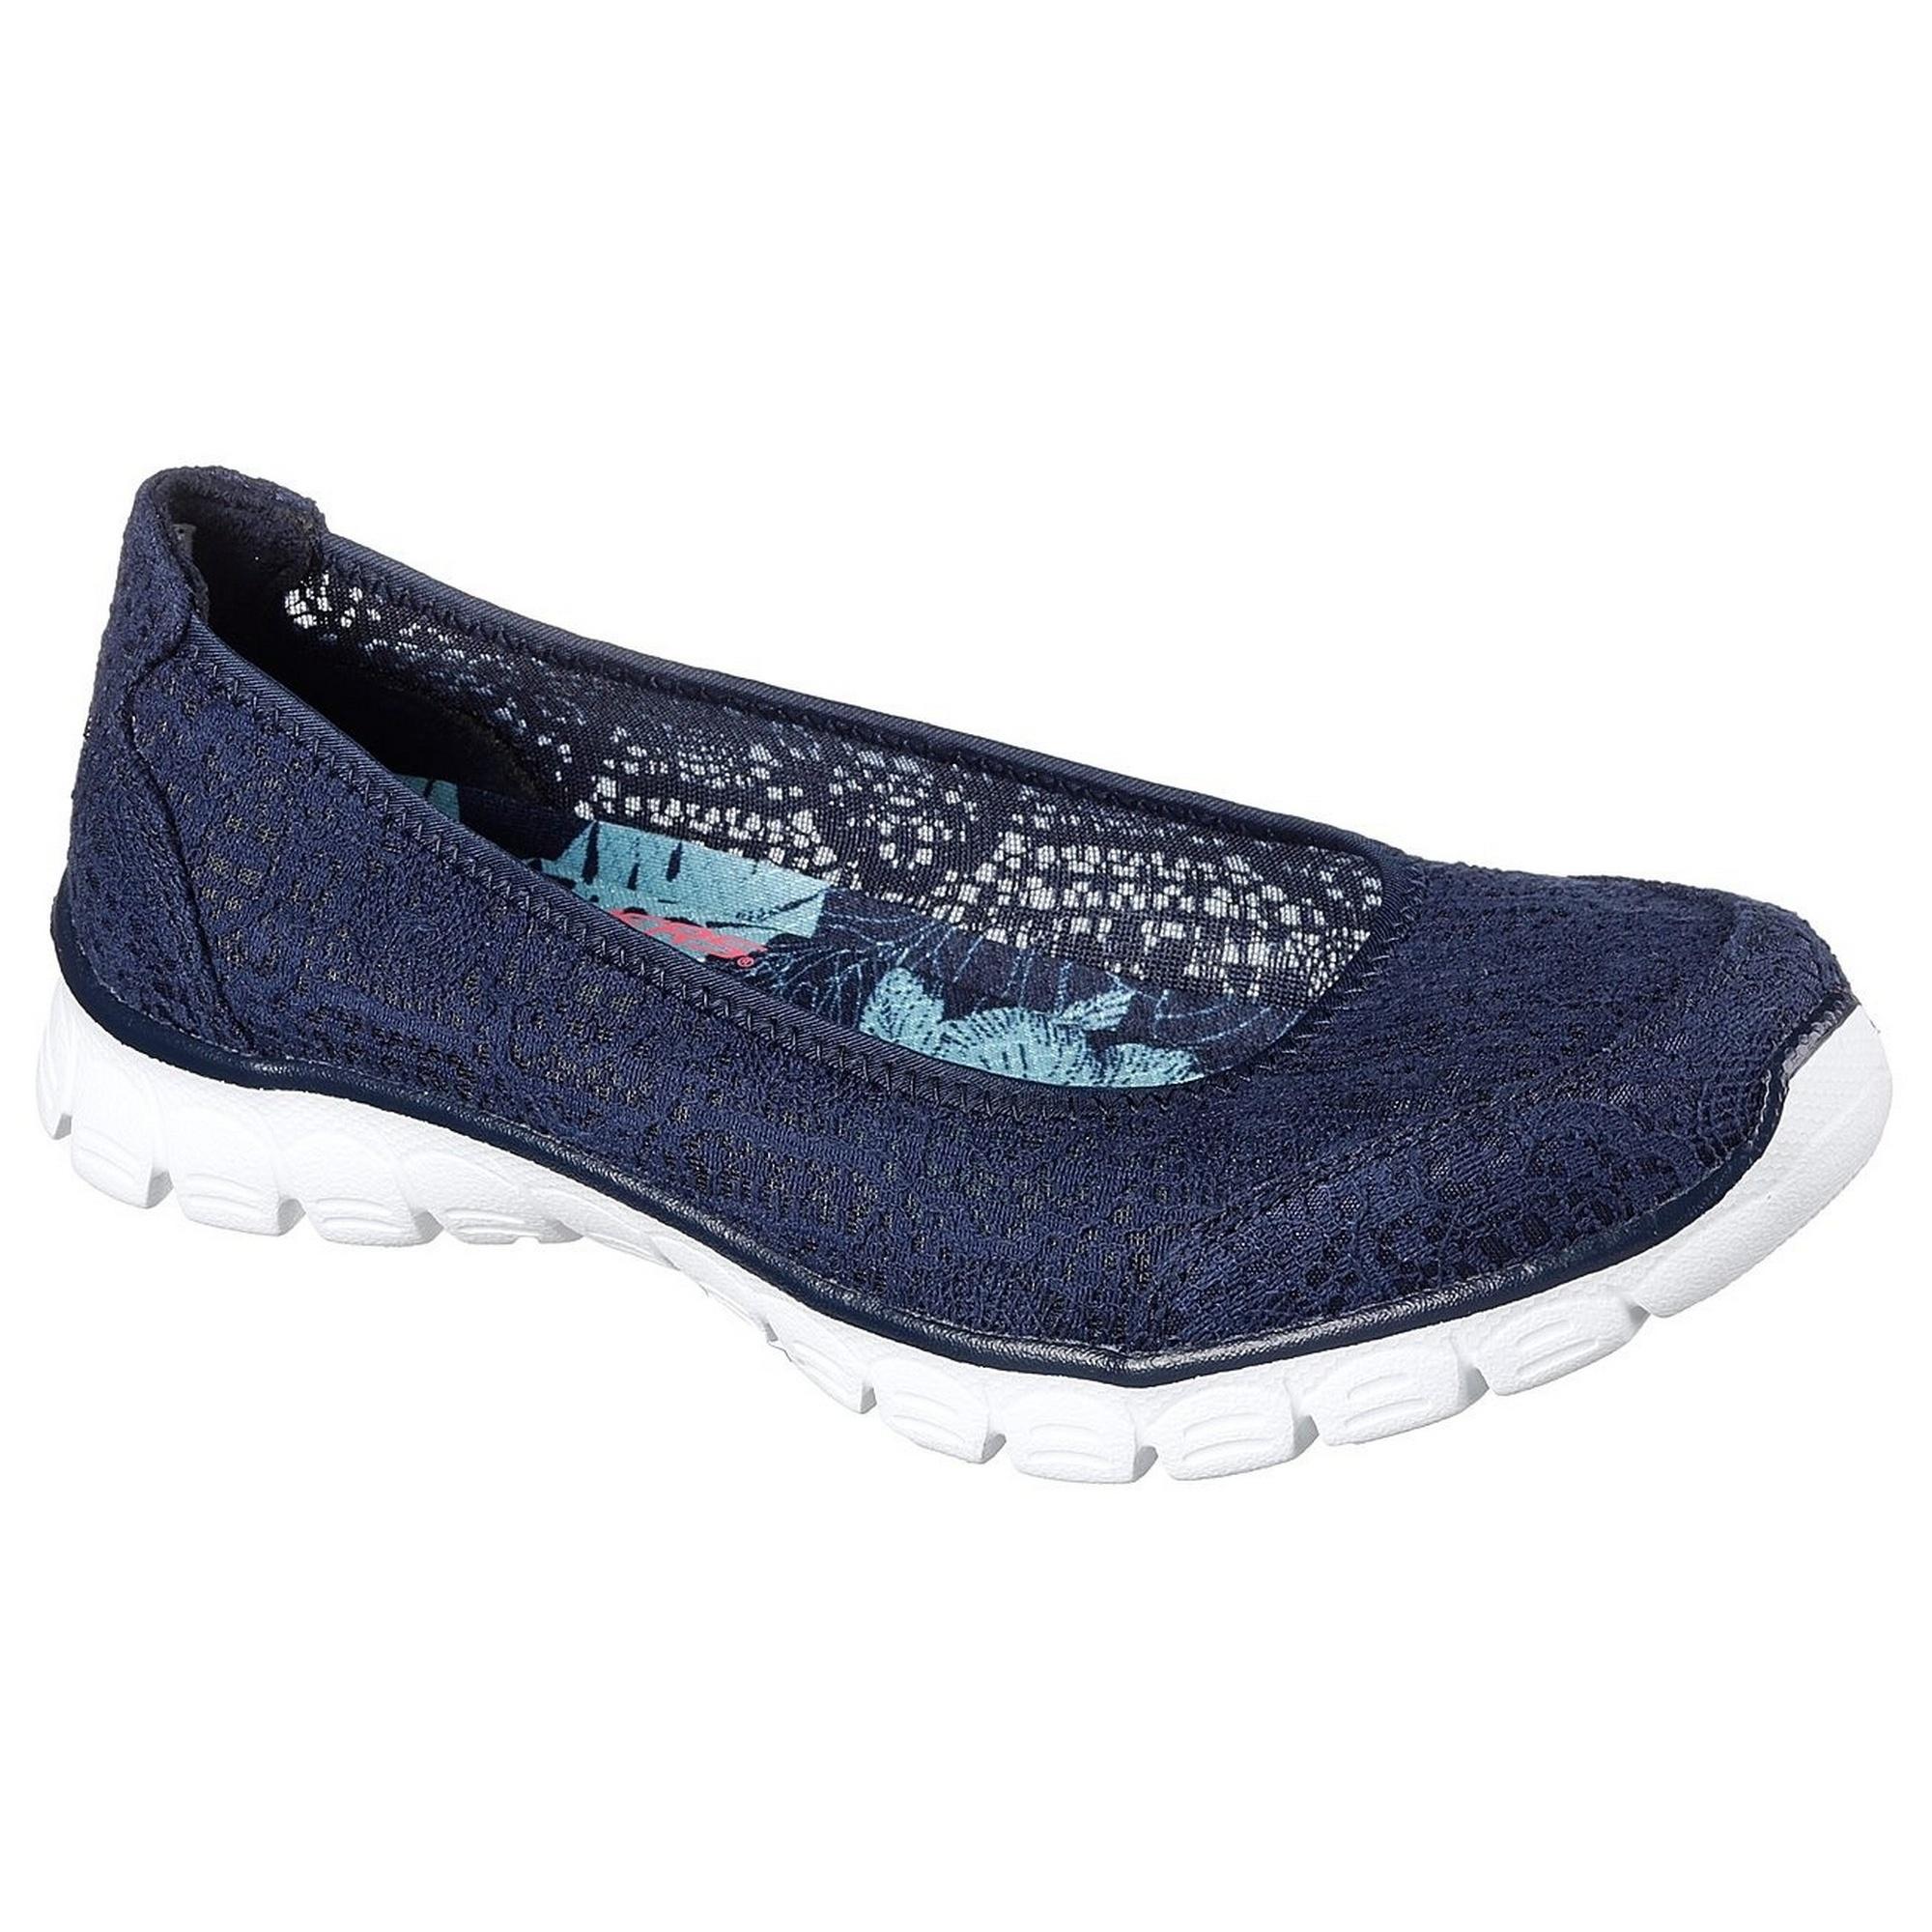 Skechers-Bailarinas-deportivas-de-verano-modelo-EZ-Flex-3-0-Beautify-FS5199 miniatura 4